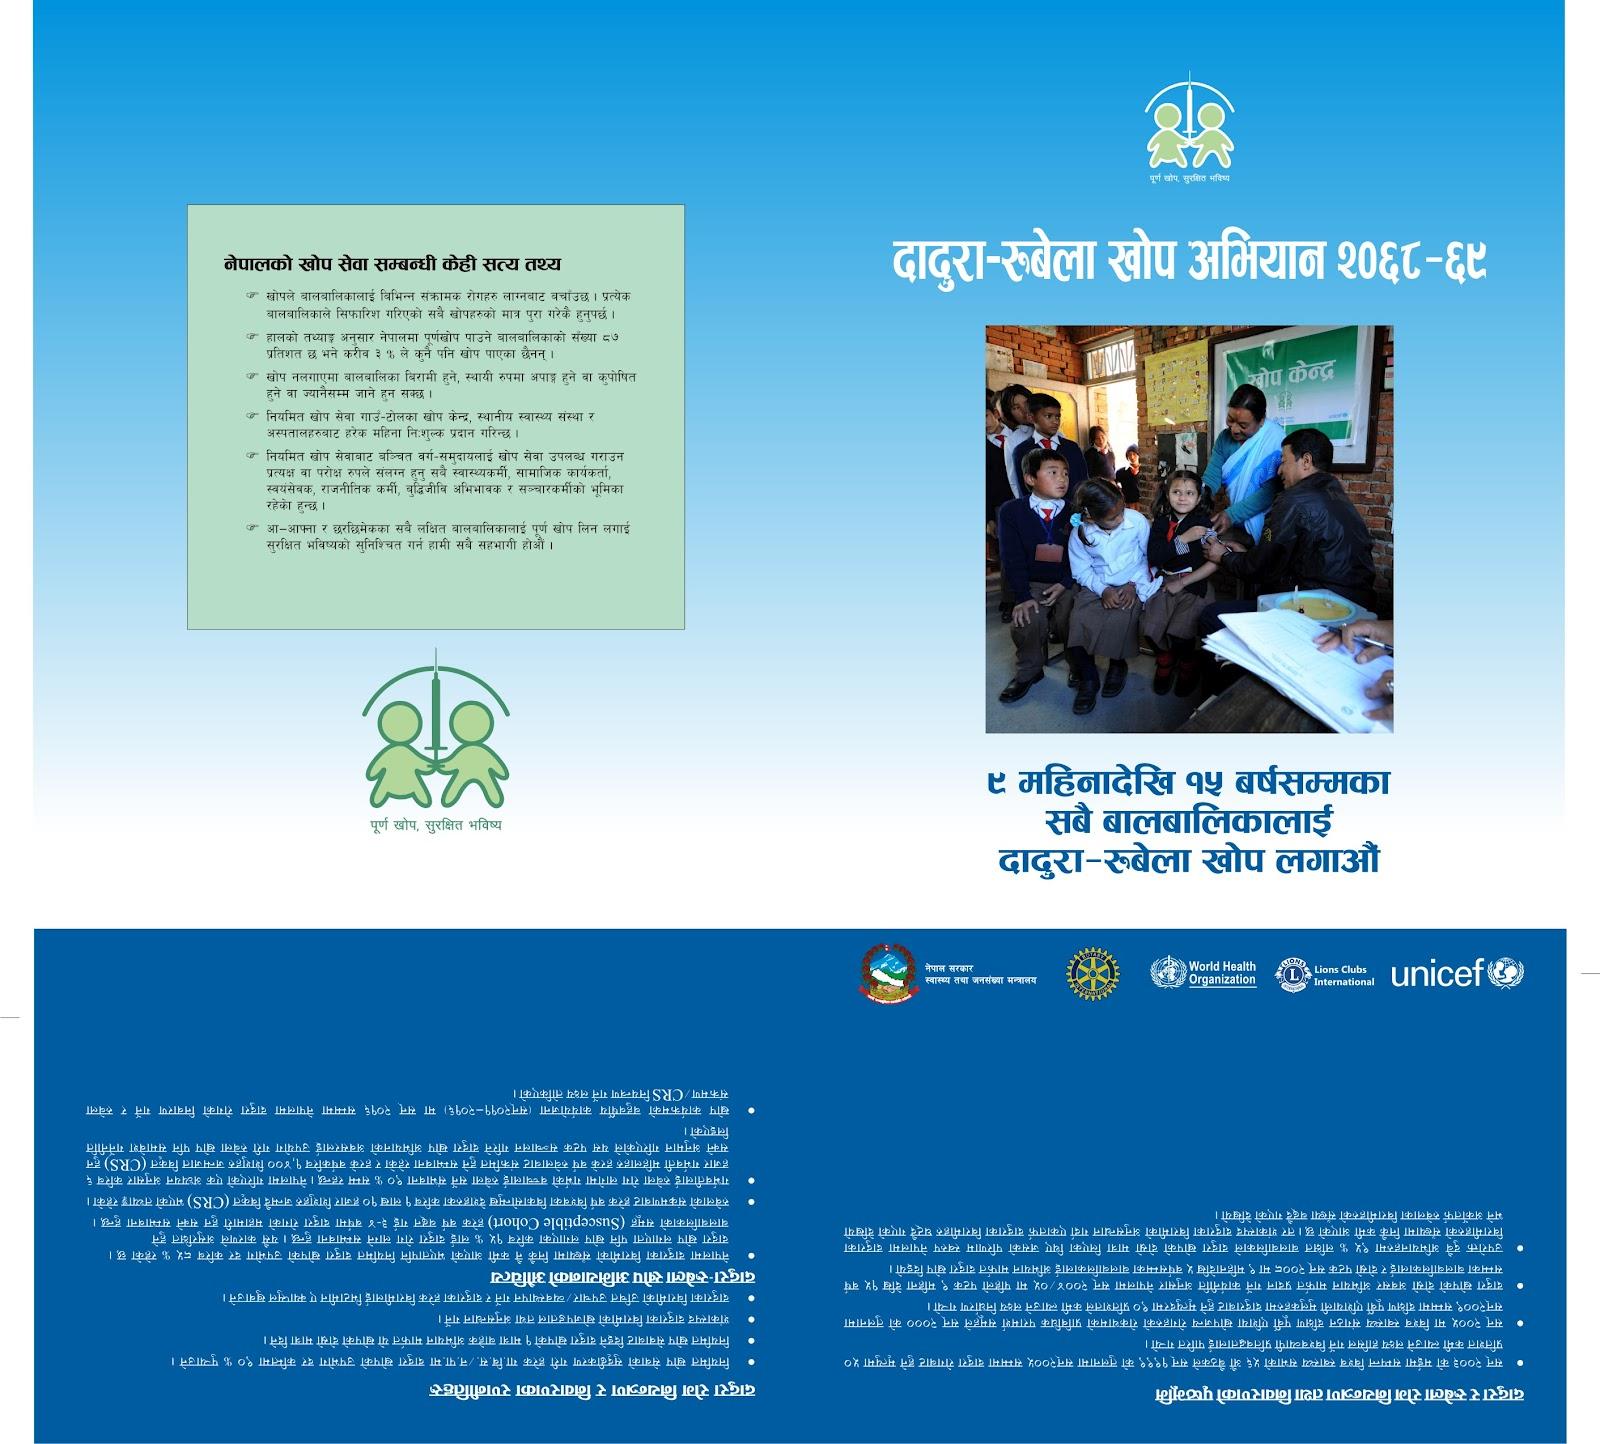 National Immunization Programme Measles Rubella Campaign